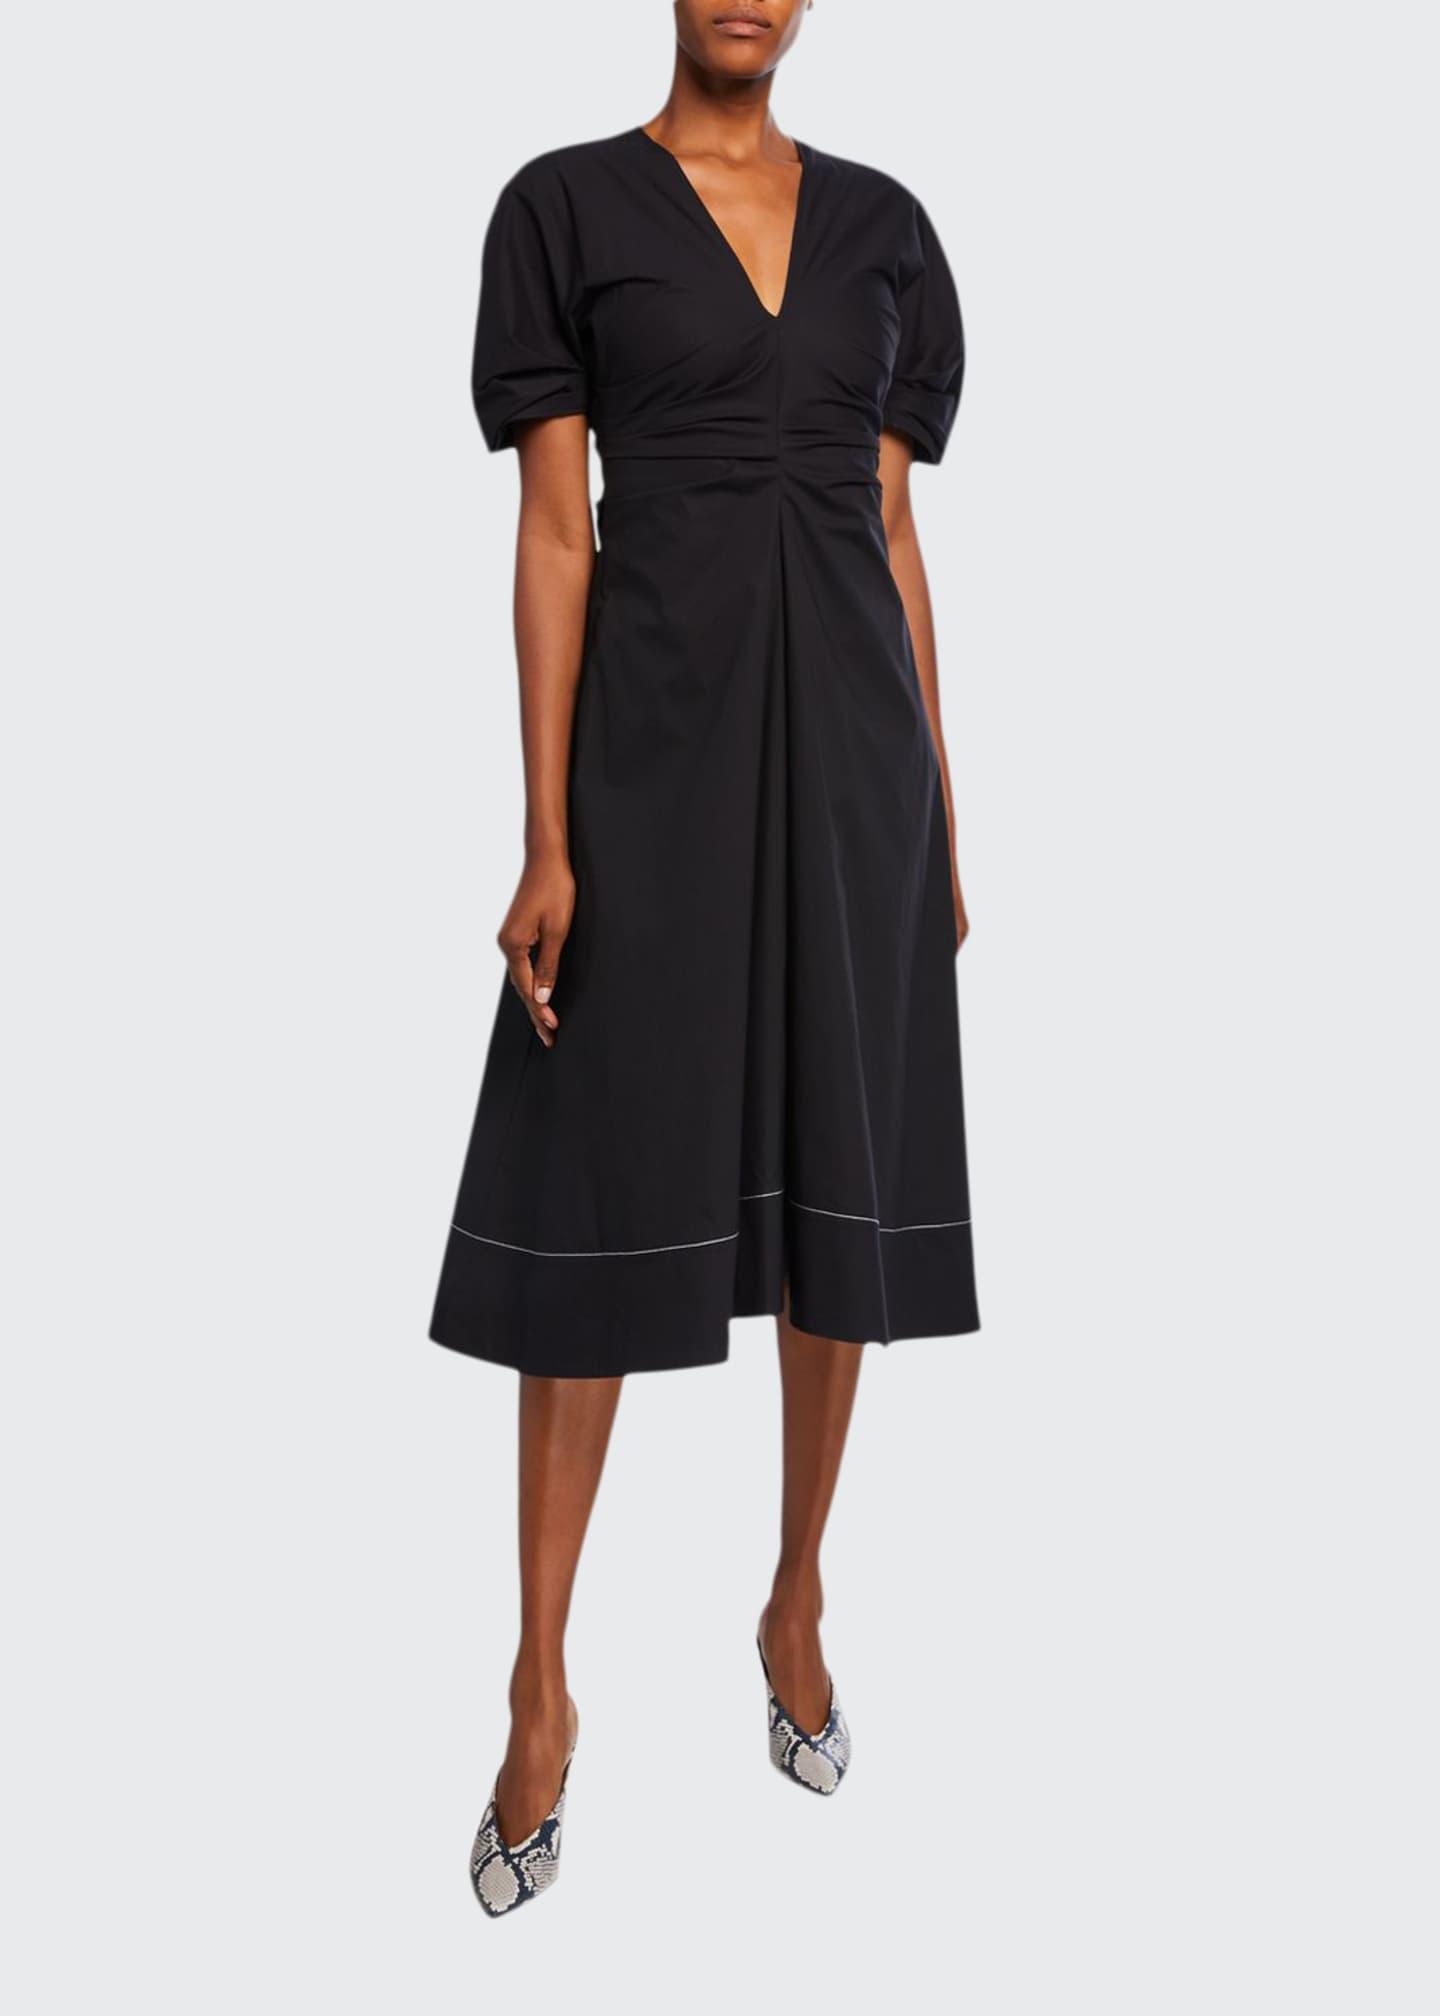 Proenza Schouler Stretch Cotton V-Neck Dress